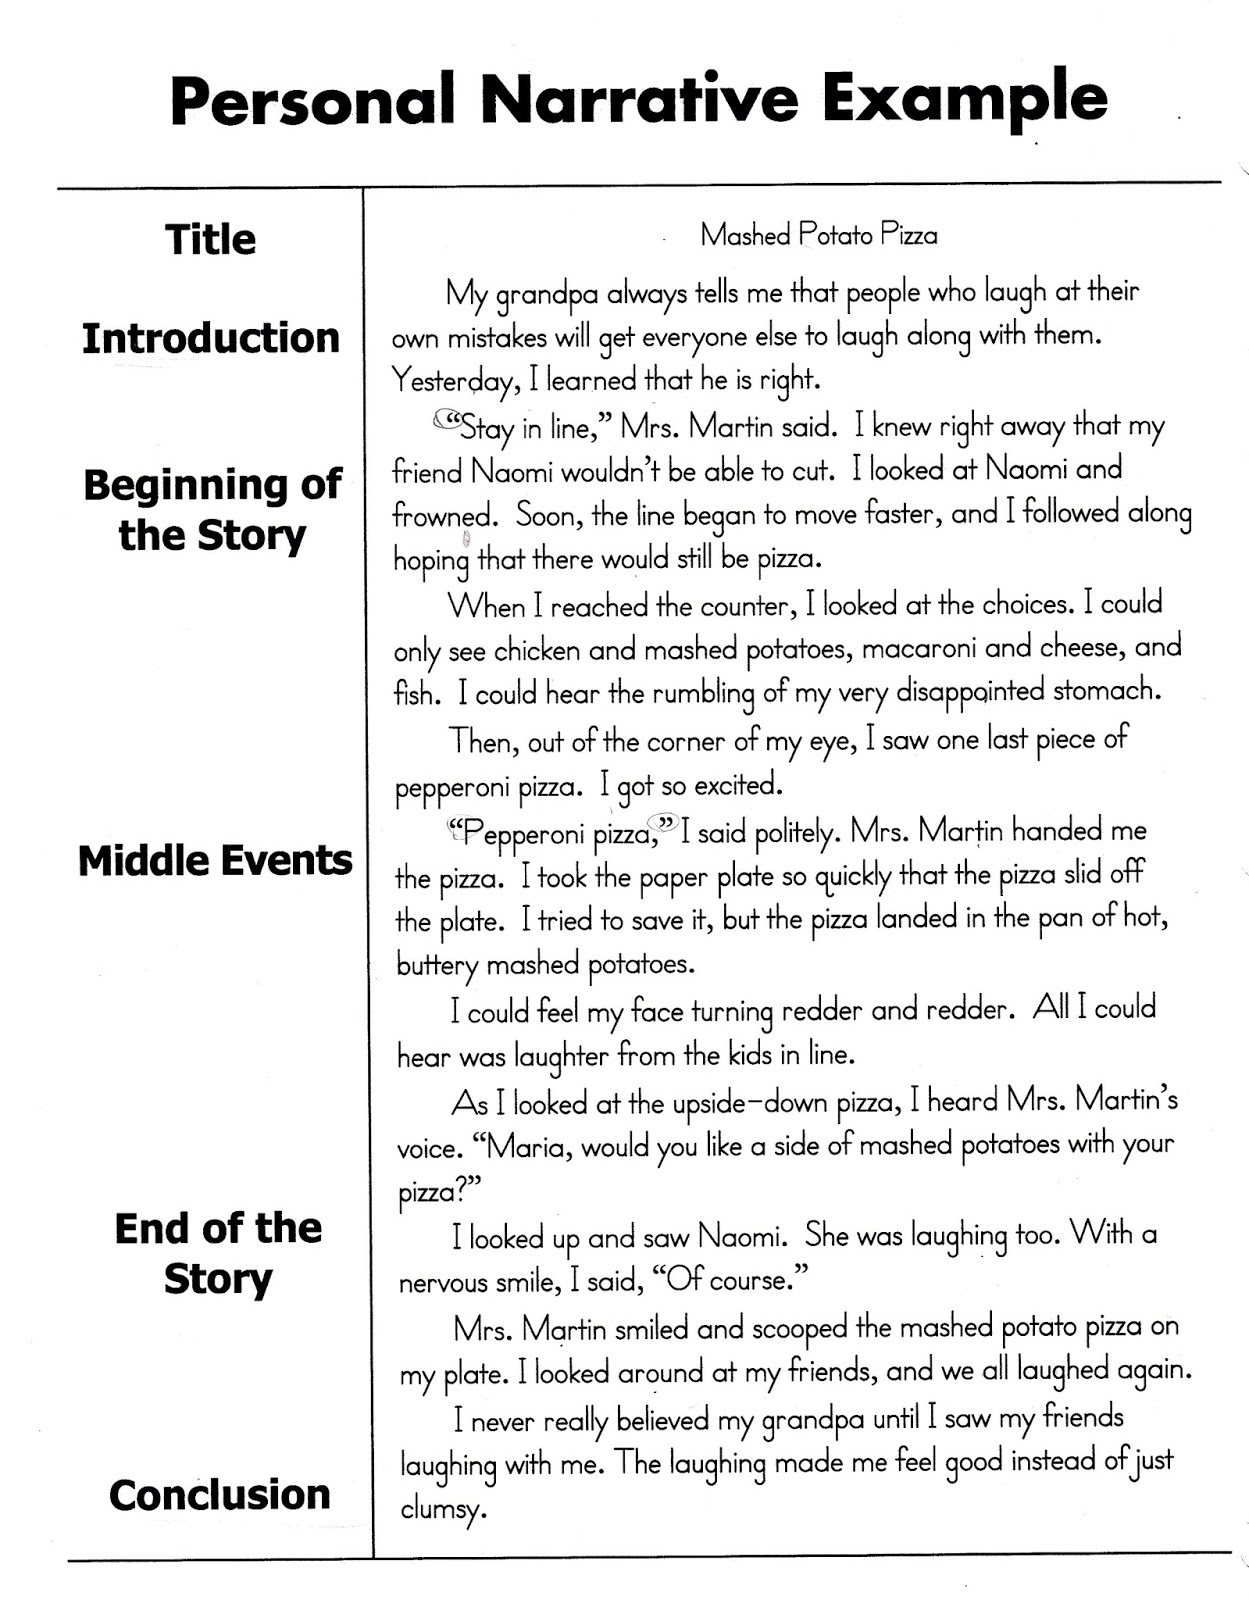 020 8th Grade Essay Topics Example Phenomenal Narrative Us History Questions Full